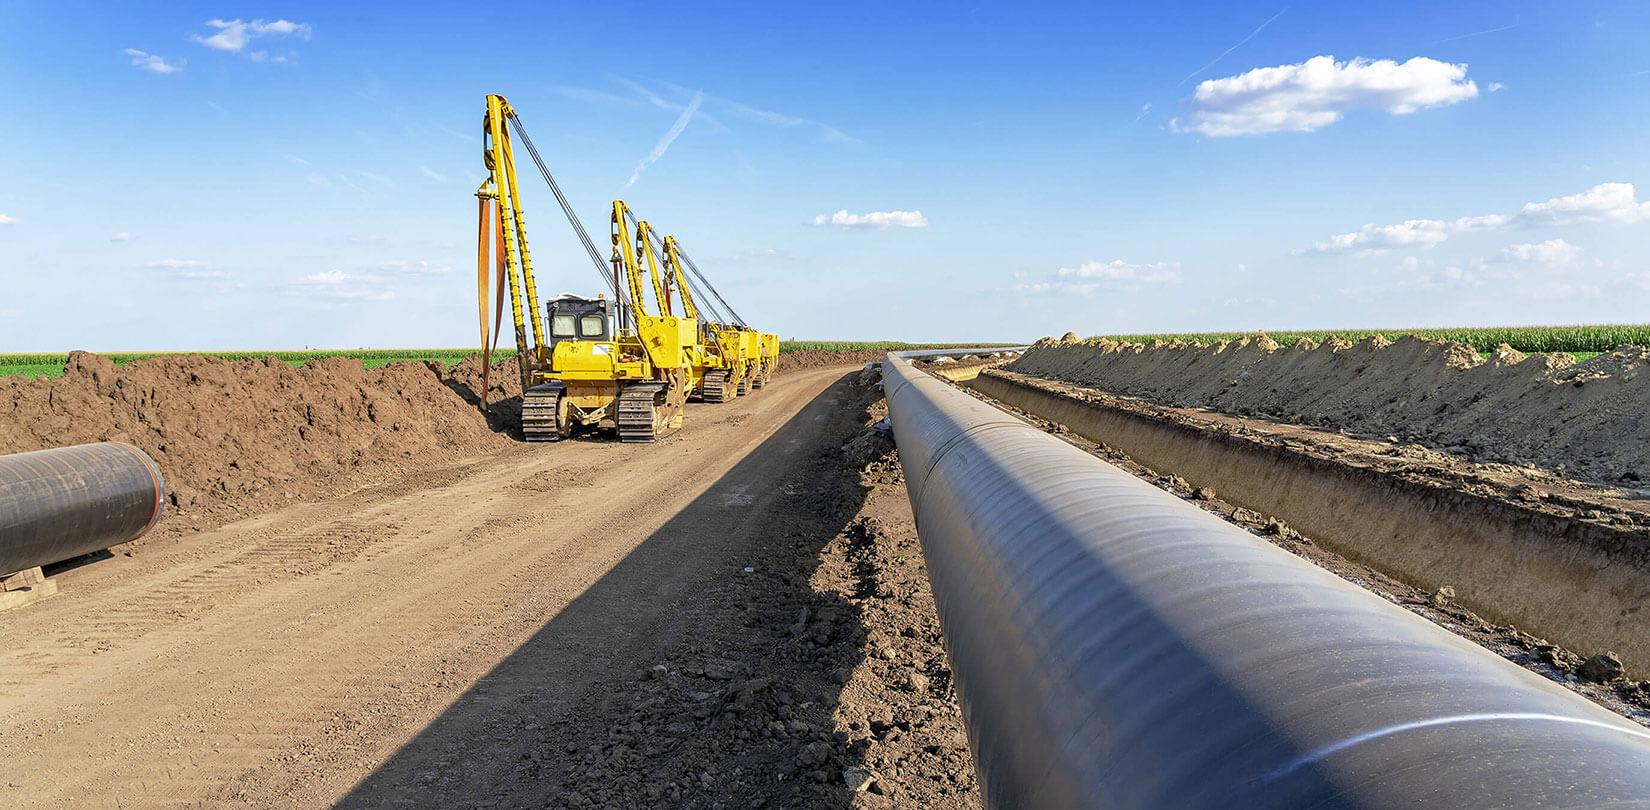 Oil Pipeline Engineering Houston, TX